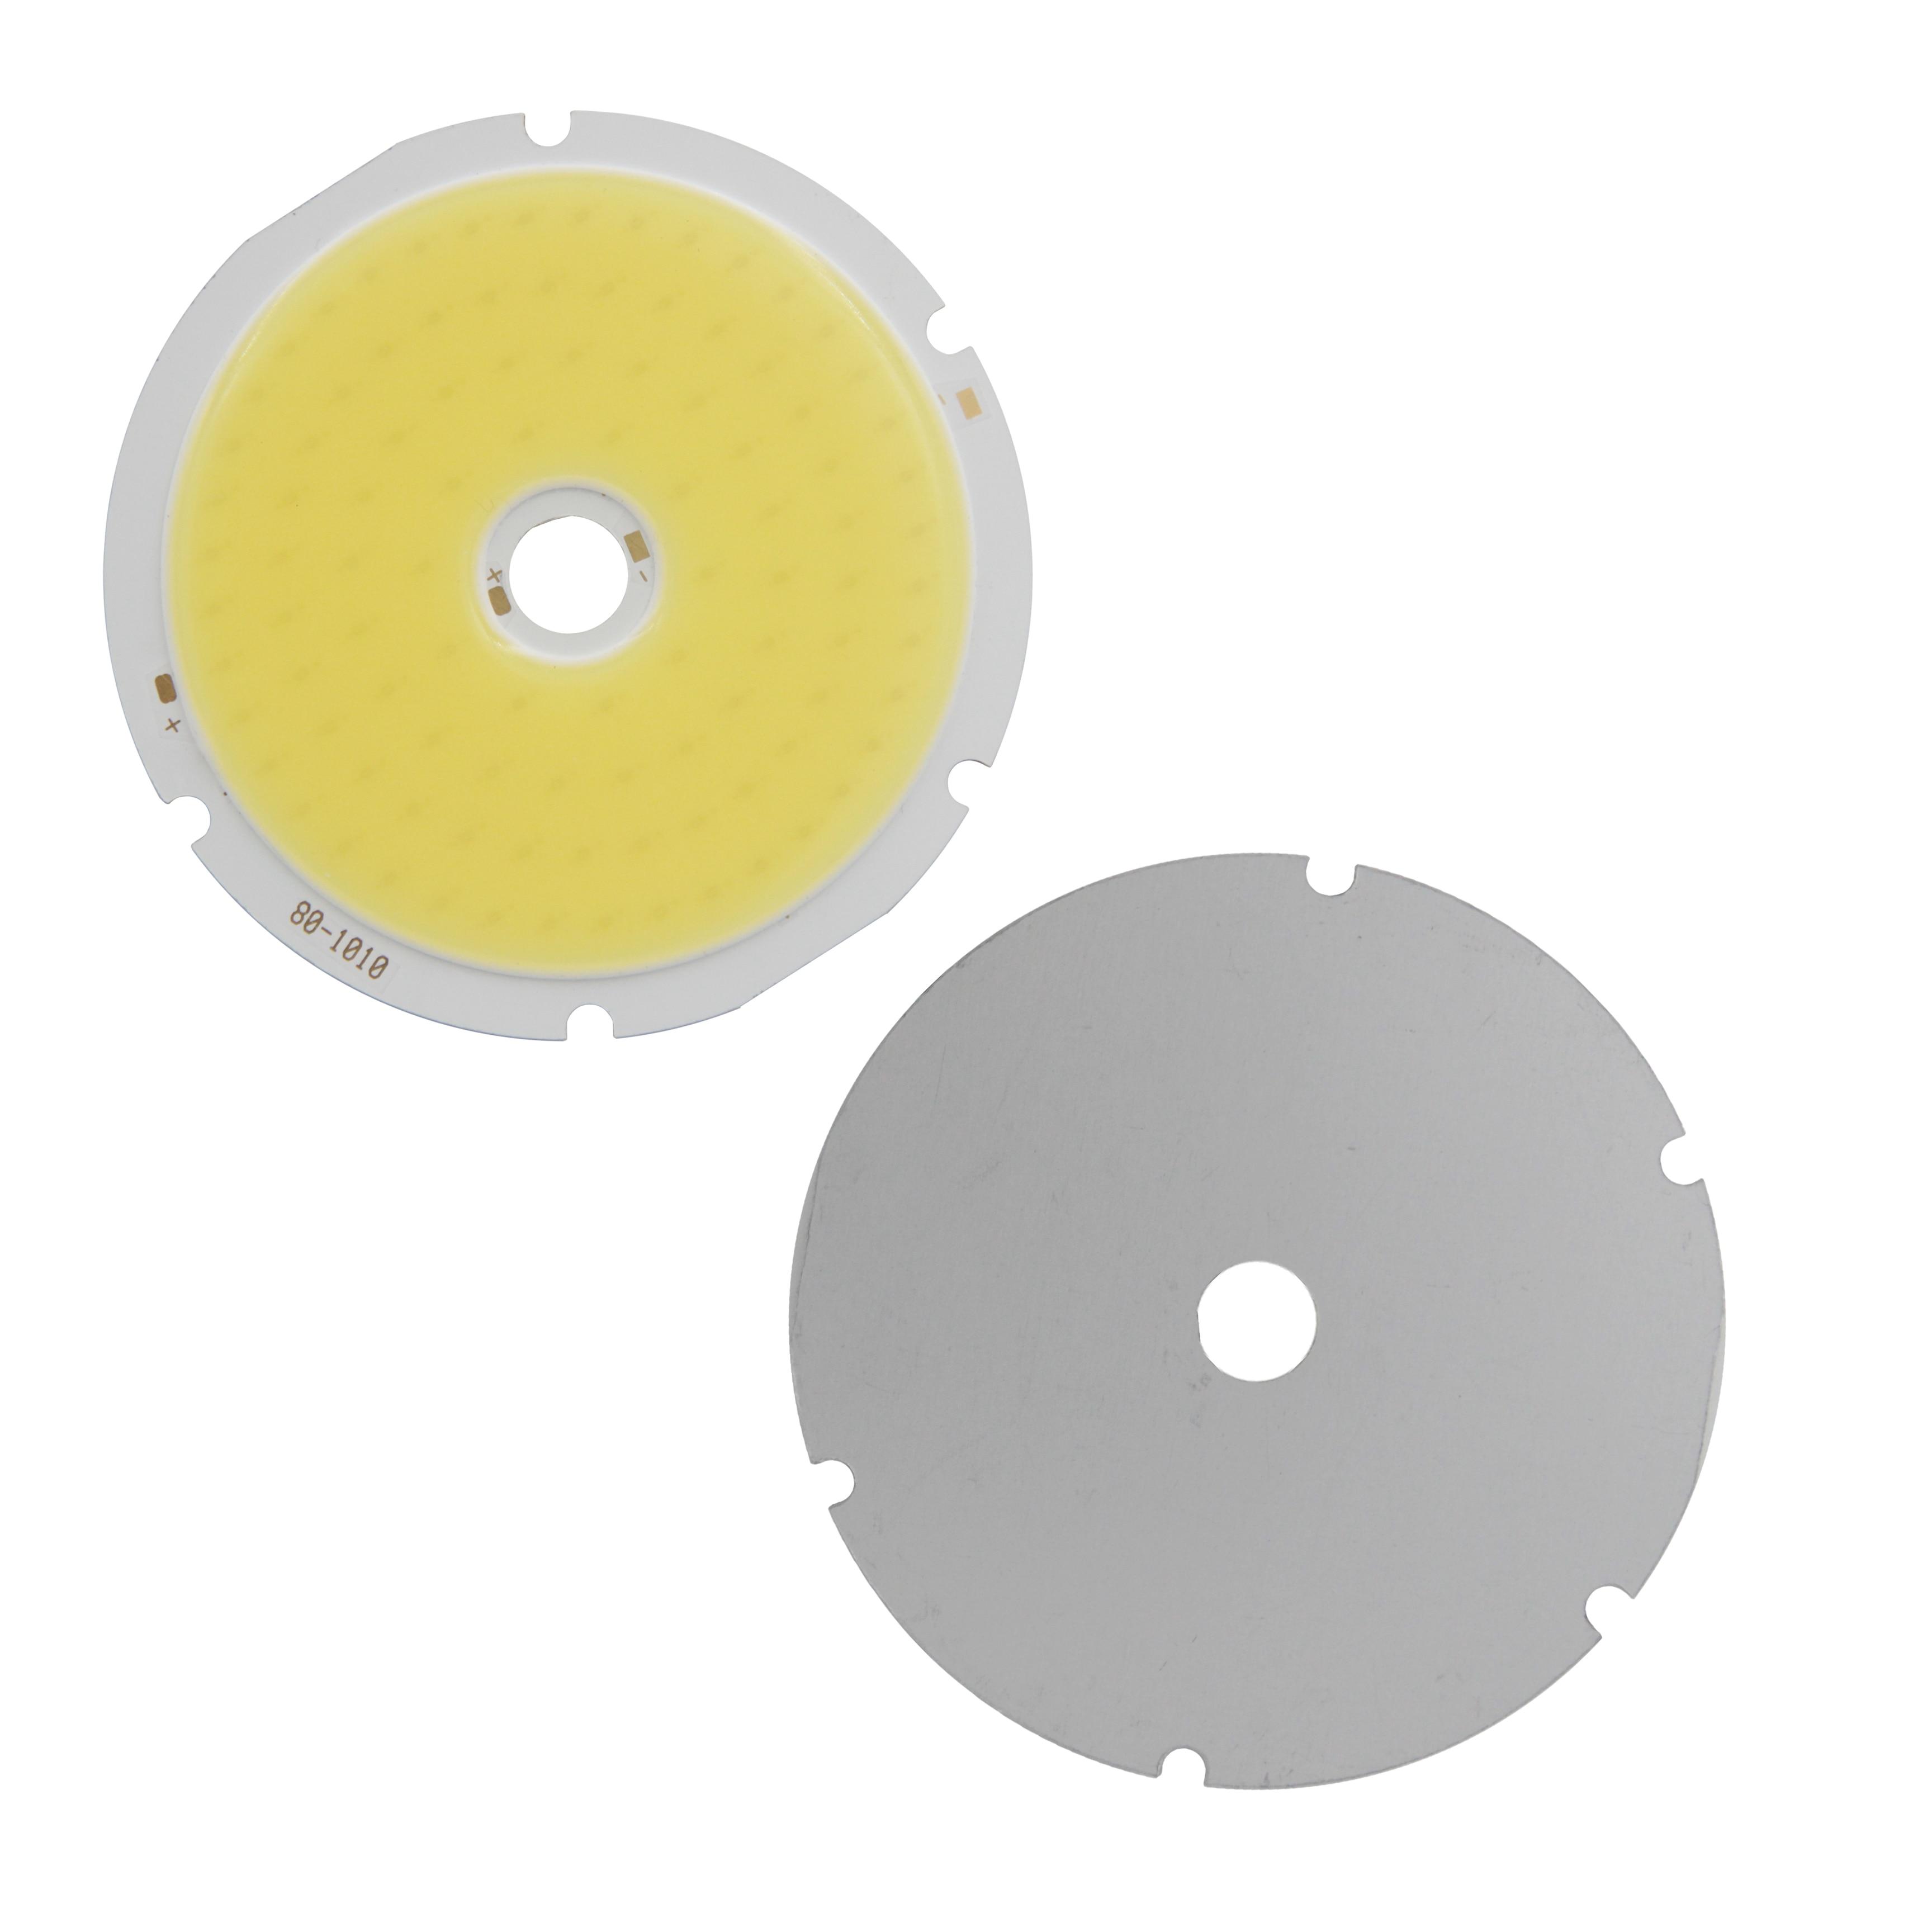 10PCS 80mm Annular 50W LED COB Light Source High Power White Warm White LED Strip Module Chip For Down Light DIY lamp